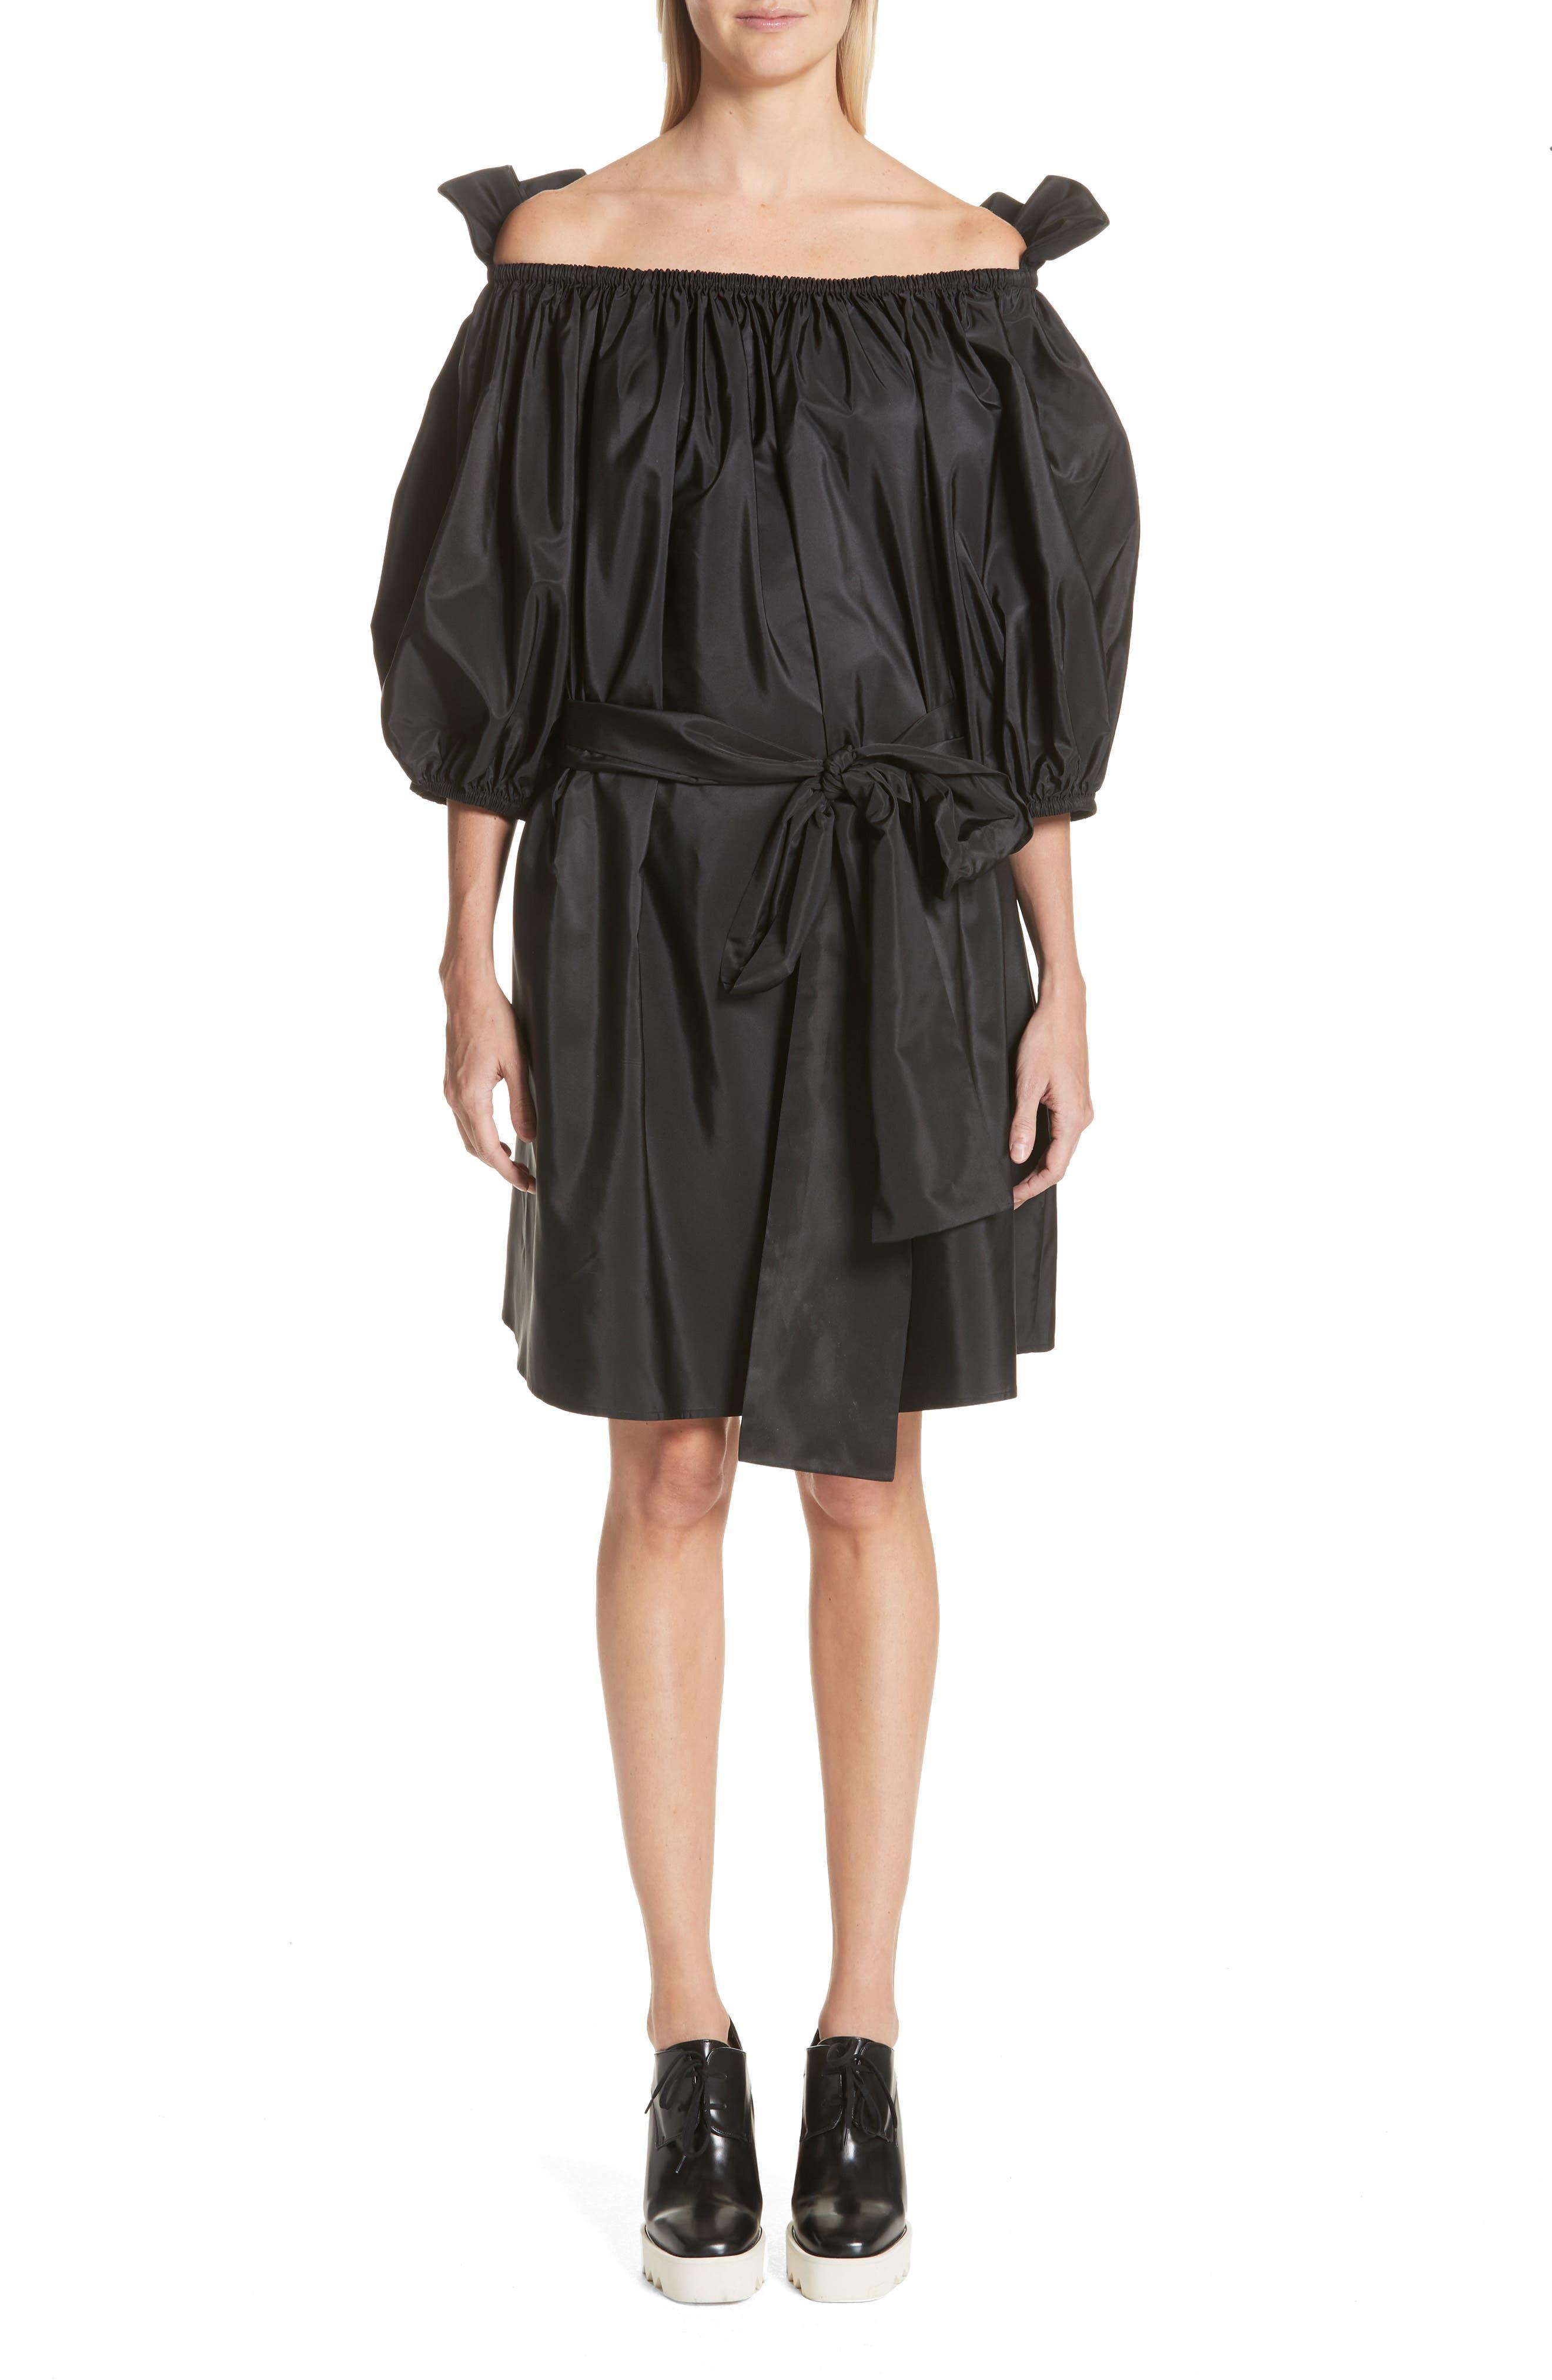 Belted Off the Shoulder Taffeta Dress,                             Main thumbnail 1, color,                             Black